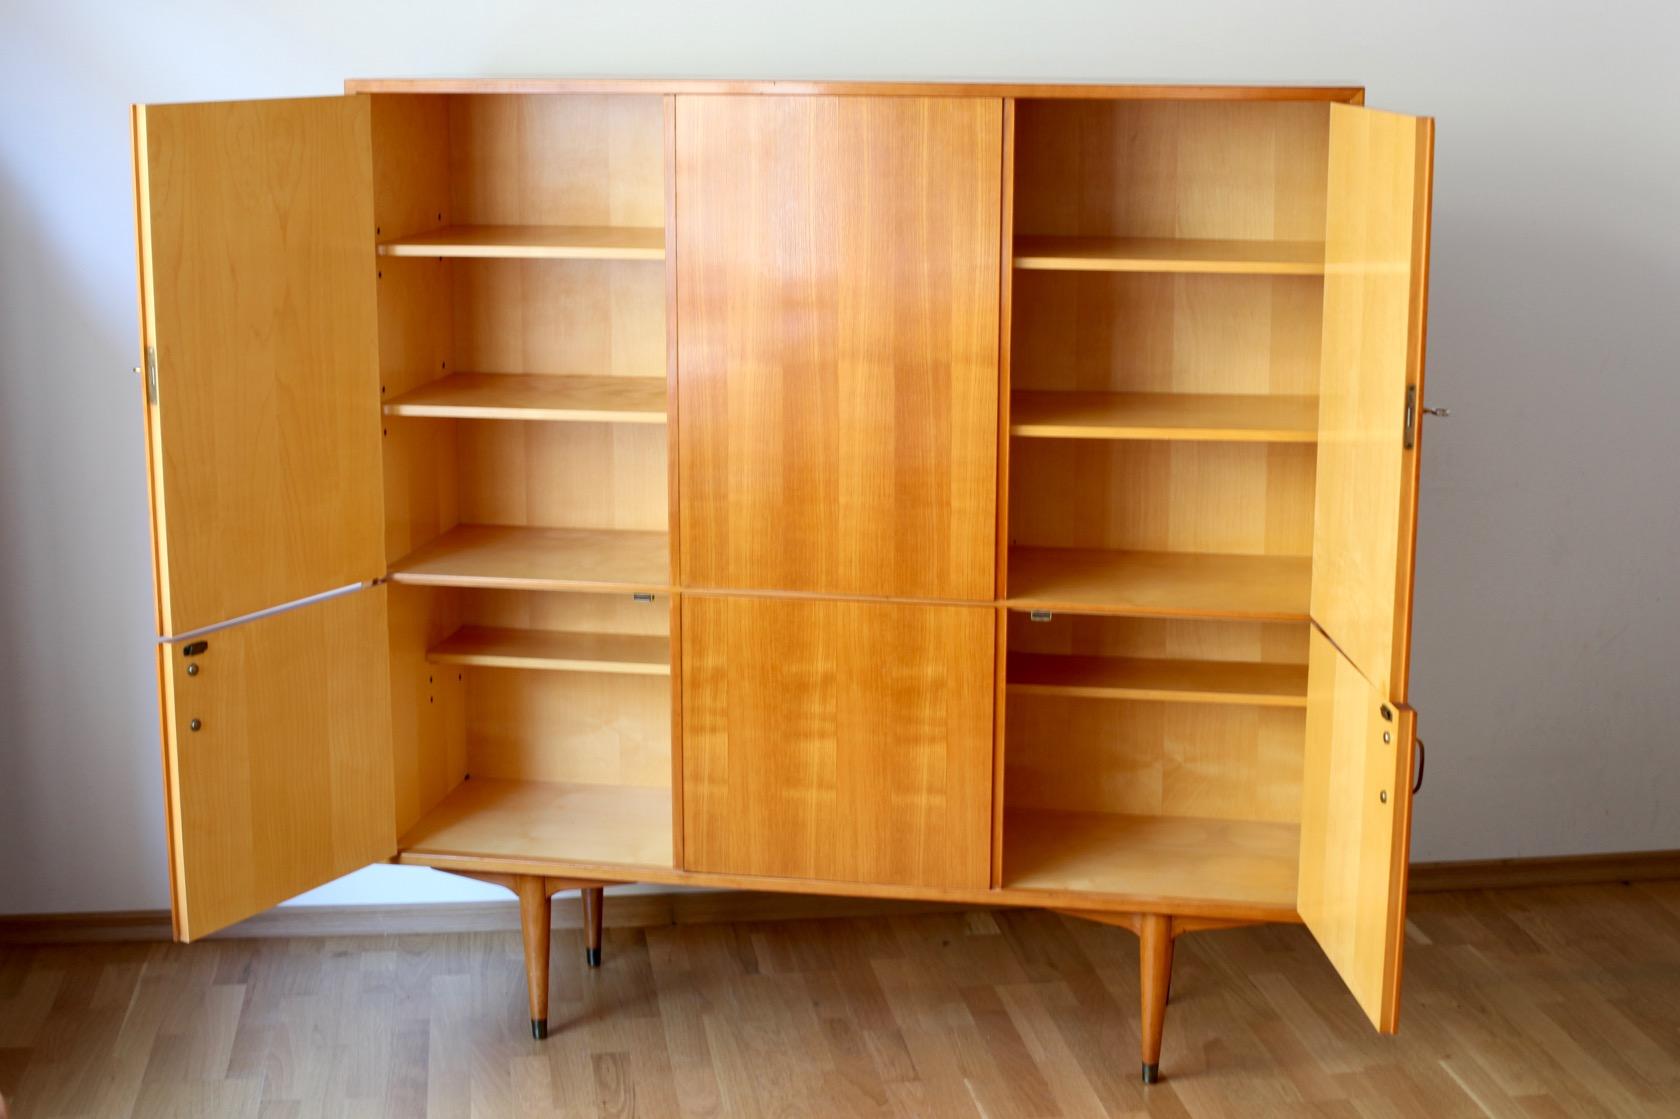 50ies highboard in kirsche raumwunder vintage wohnen in n rnberg. Black Bedroom Furniture Sets. Home Design Ideas